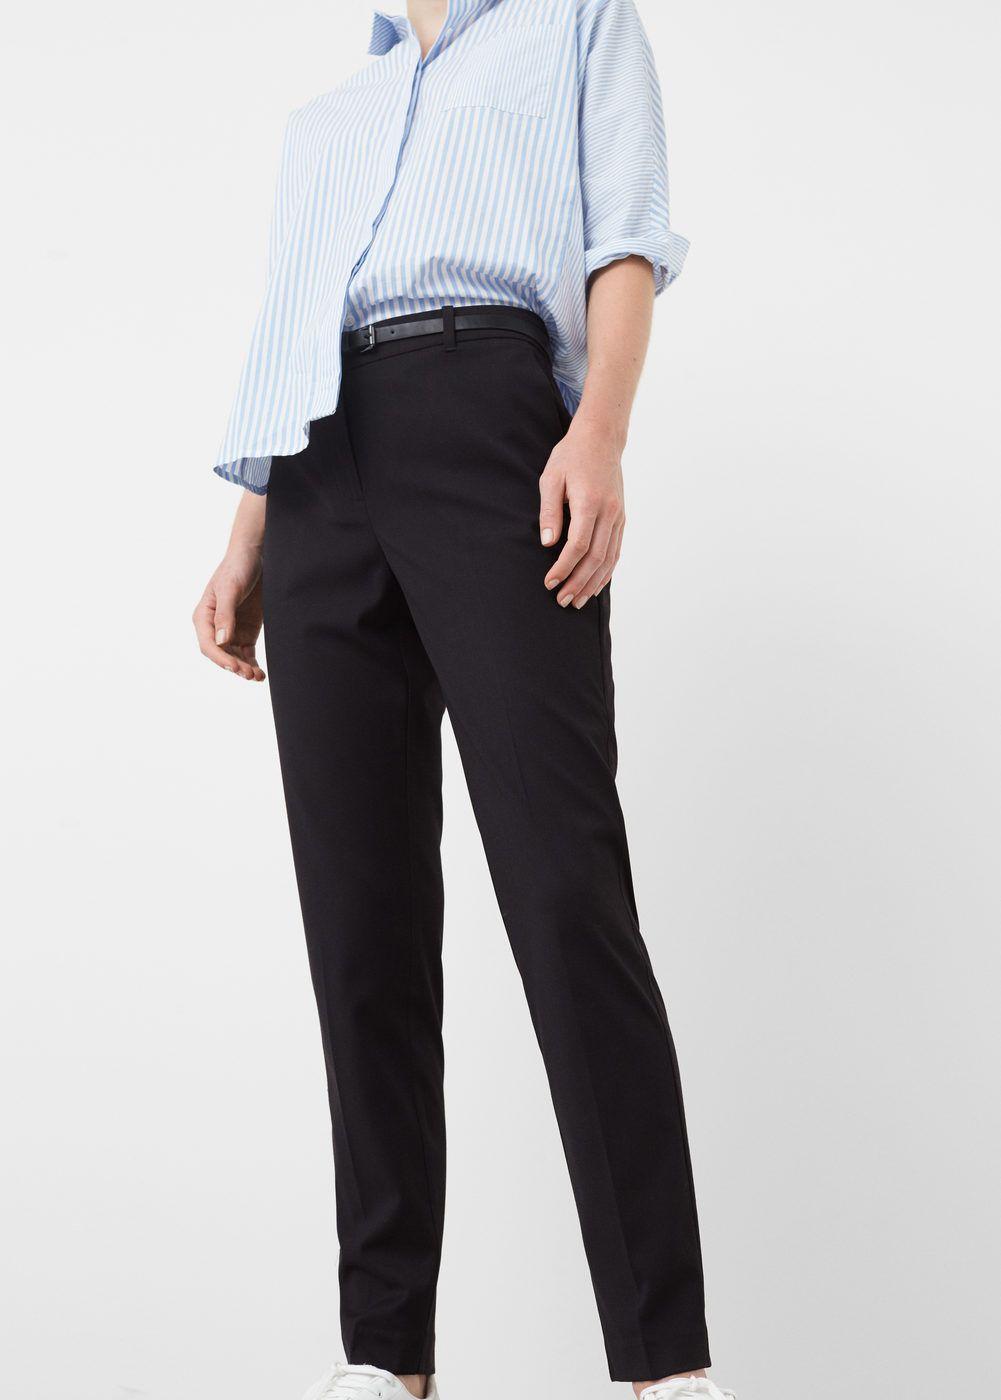 Pantalón recto traje - Pantalones de Mujer  3901b992b2a